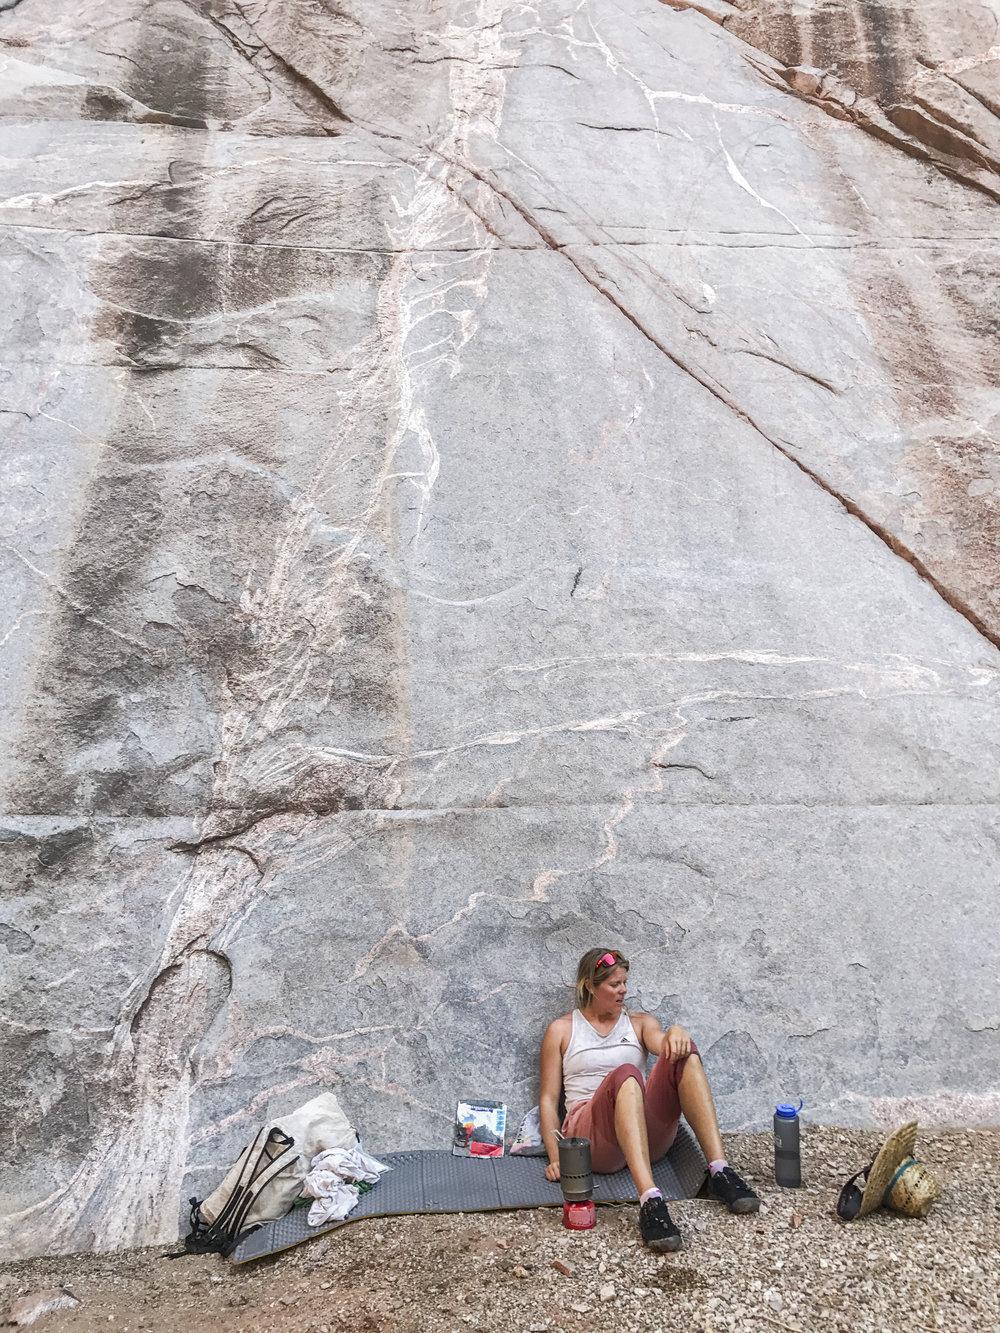 Chasing shade in Phantom Creek Canyon